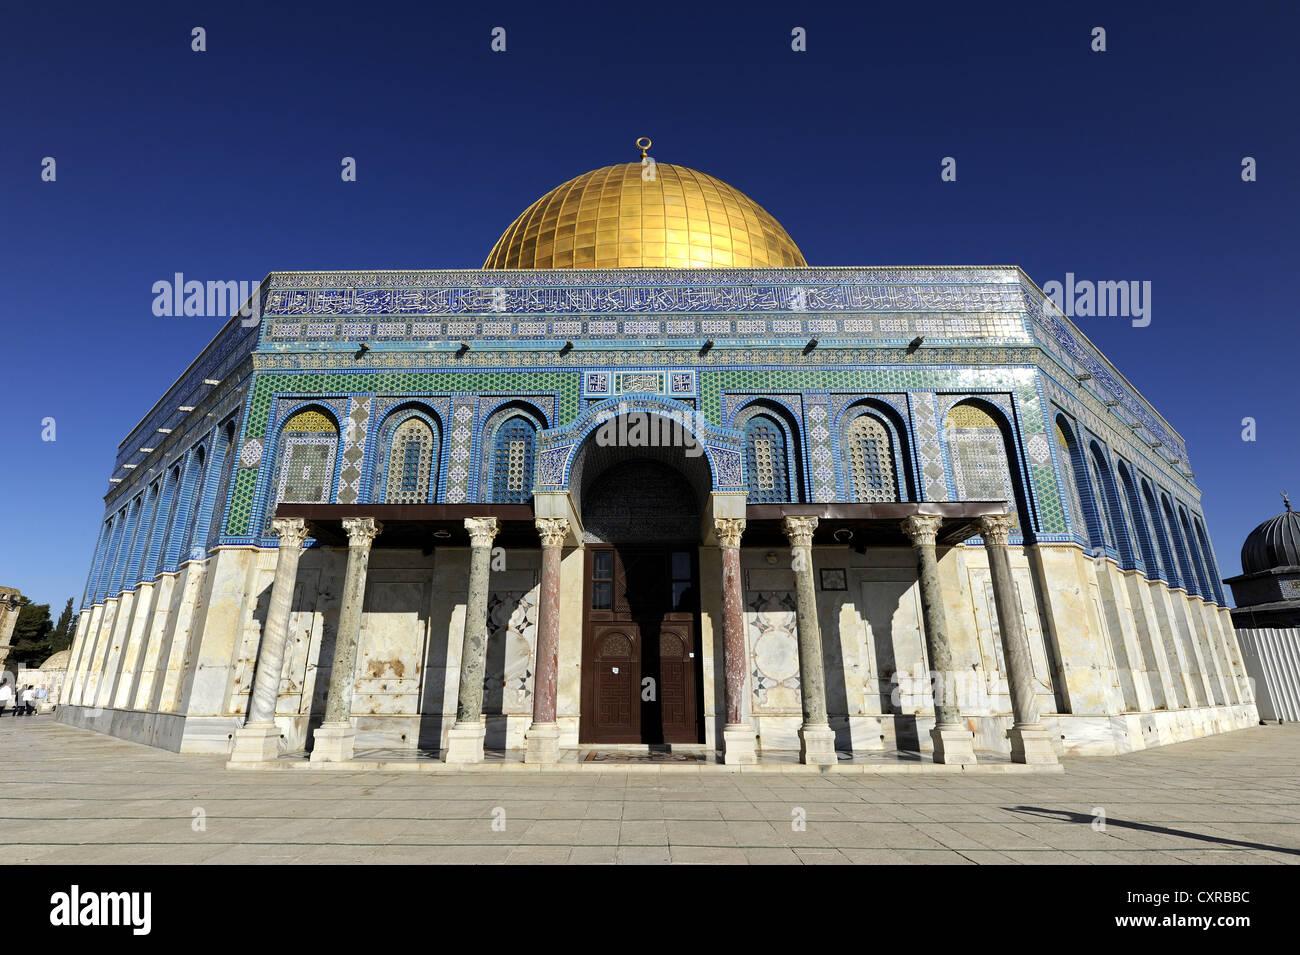 Kuppel des Rock, Tempelberg, Altstadt, Jerusalem, Israel, Naher Osten, Kleinasien, Asien Stockbild